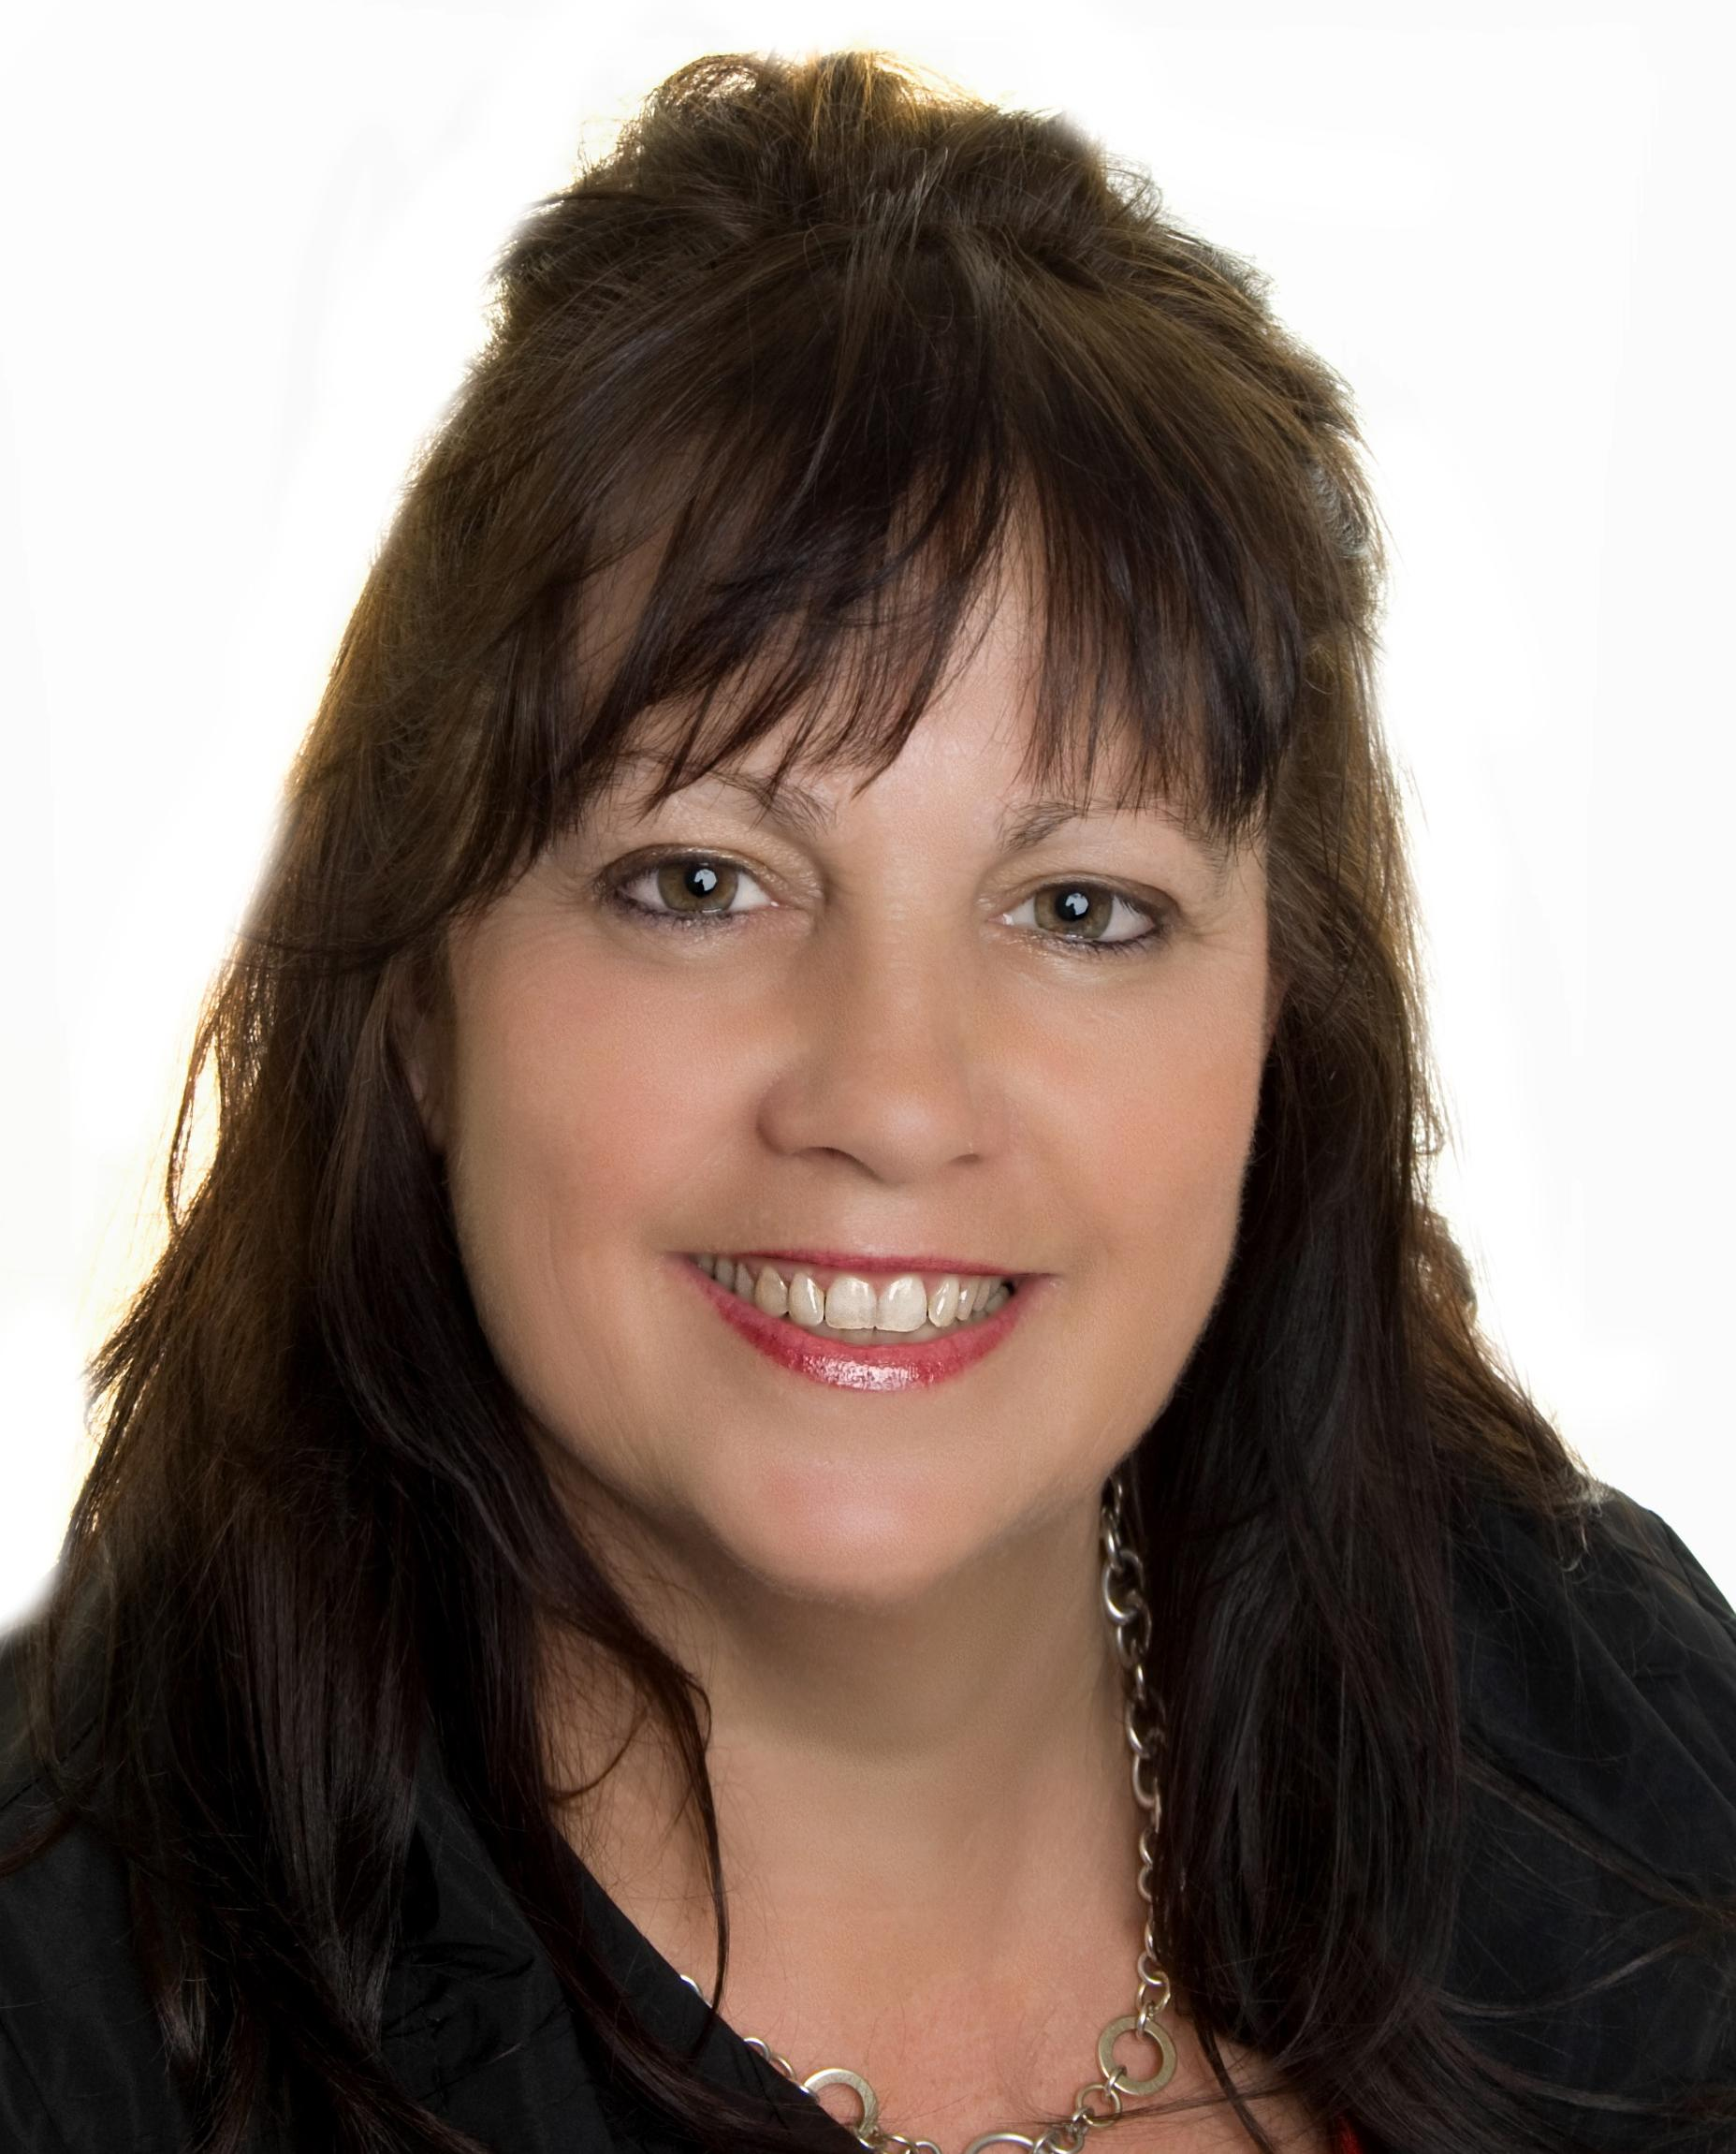 Janice Chisholm